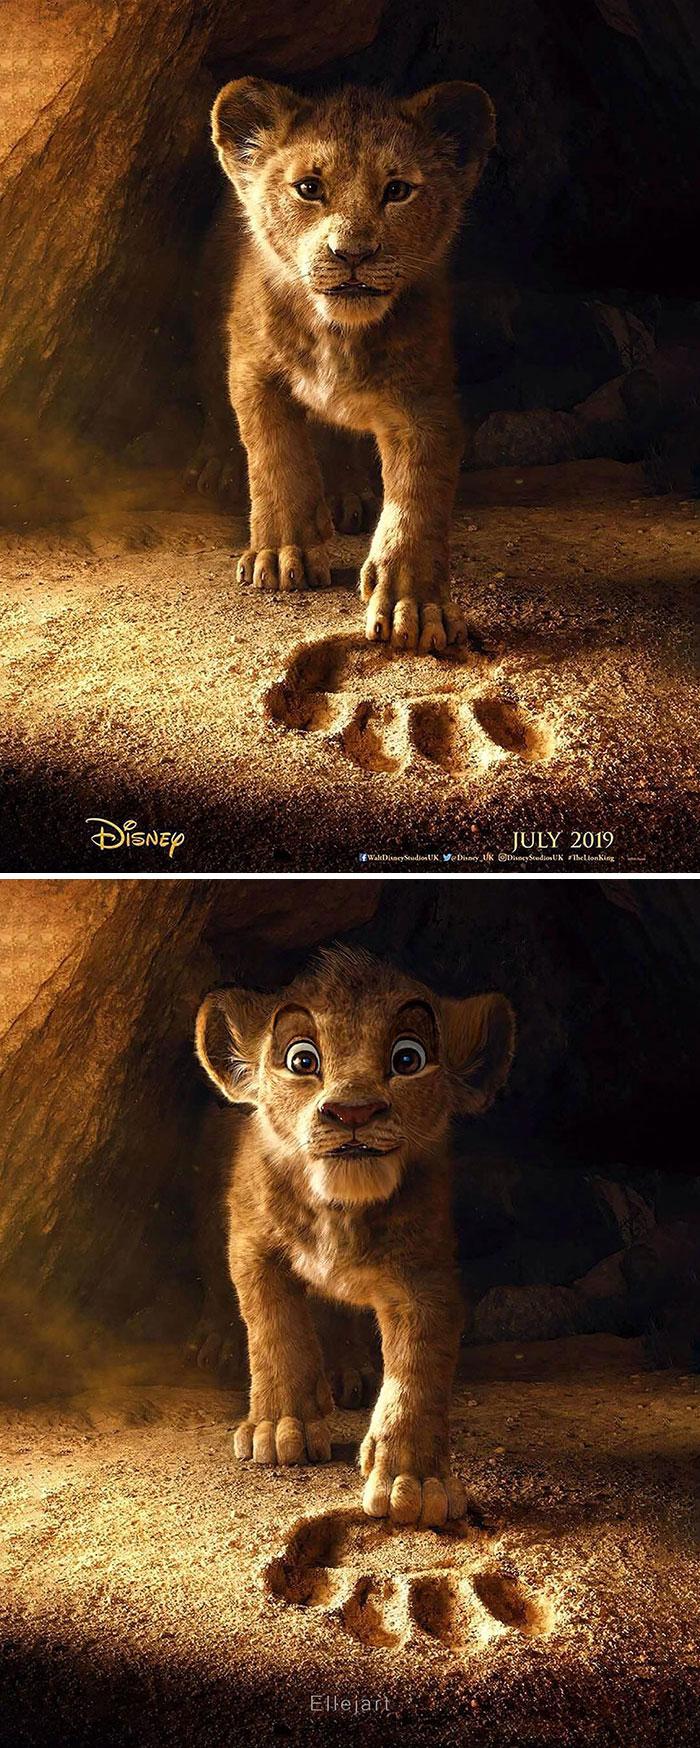 Lion King Promo Poster